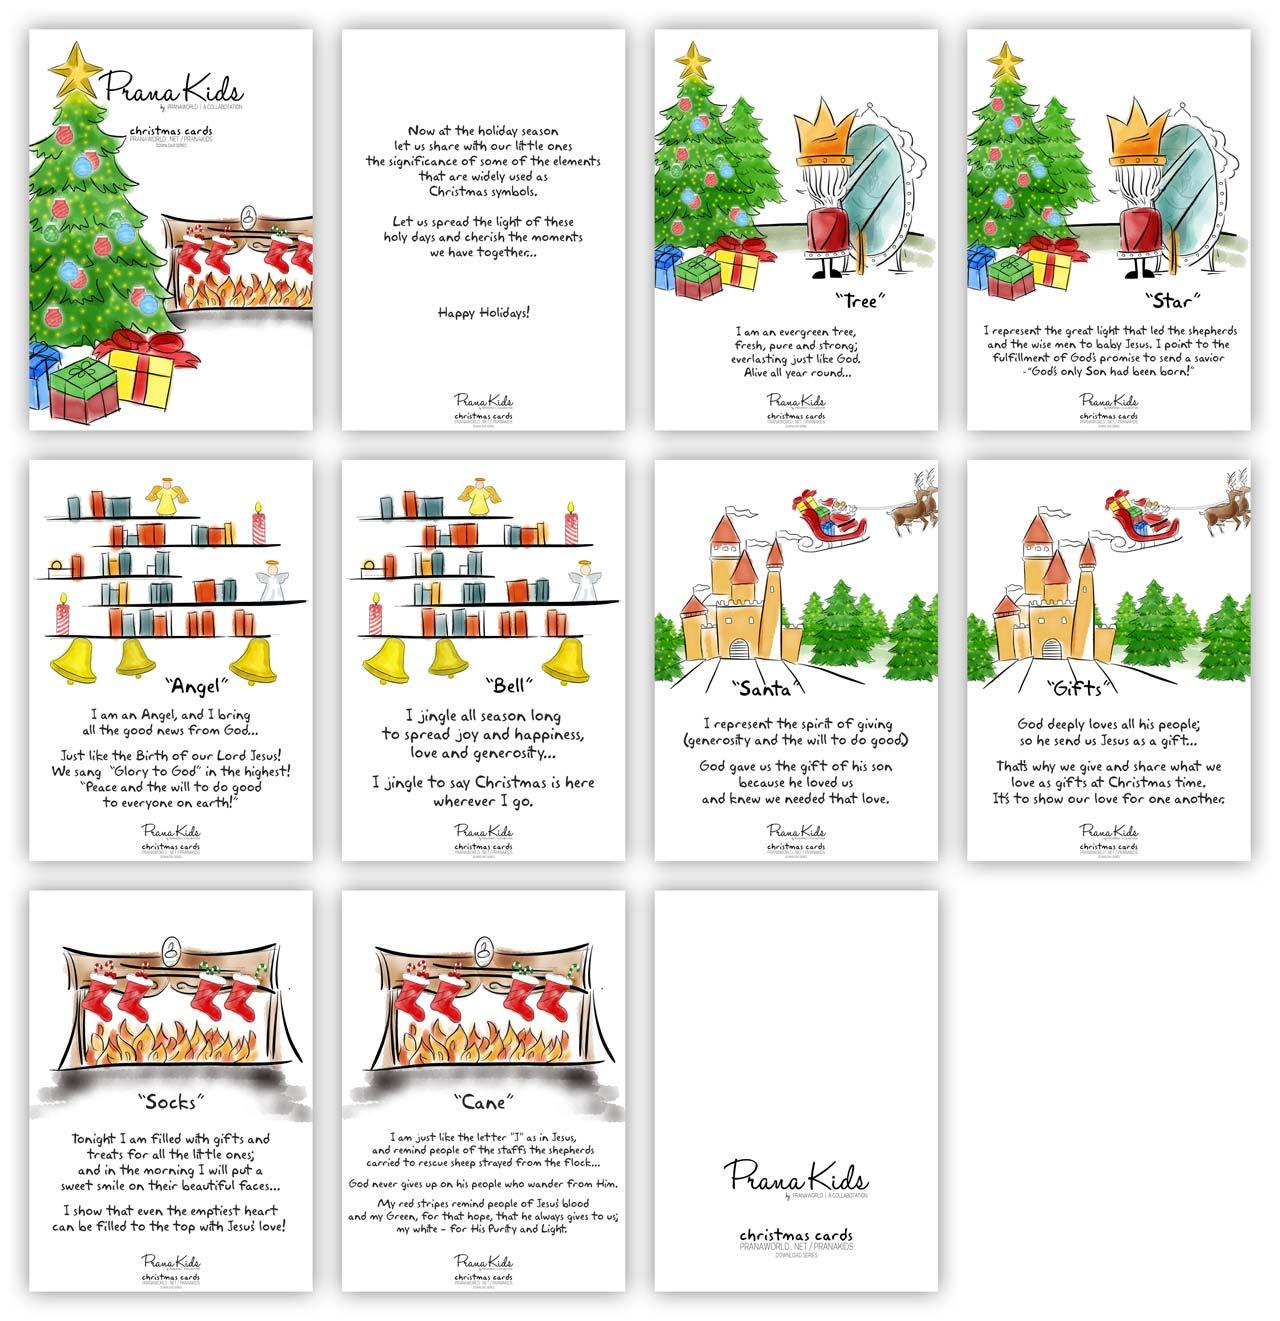 PranaKids Christmas Full Booklet